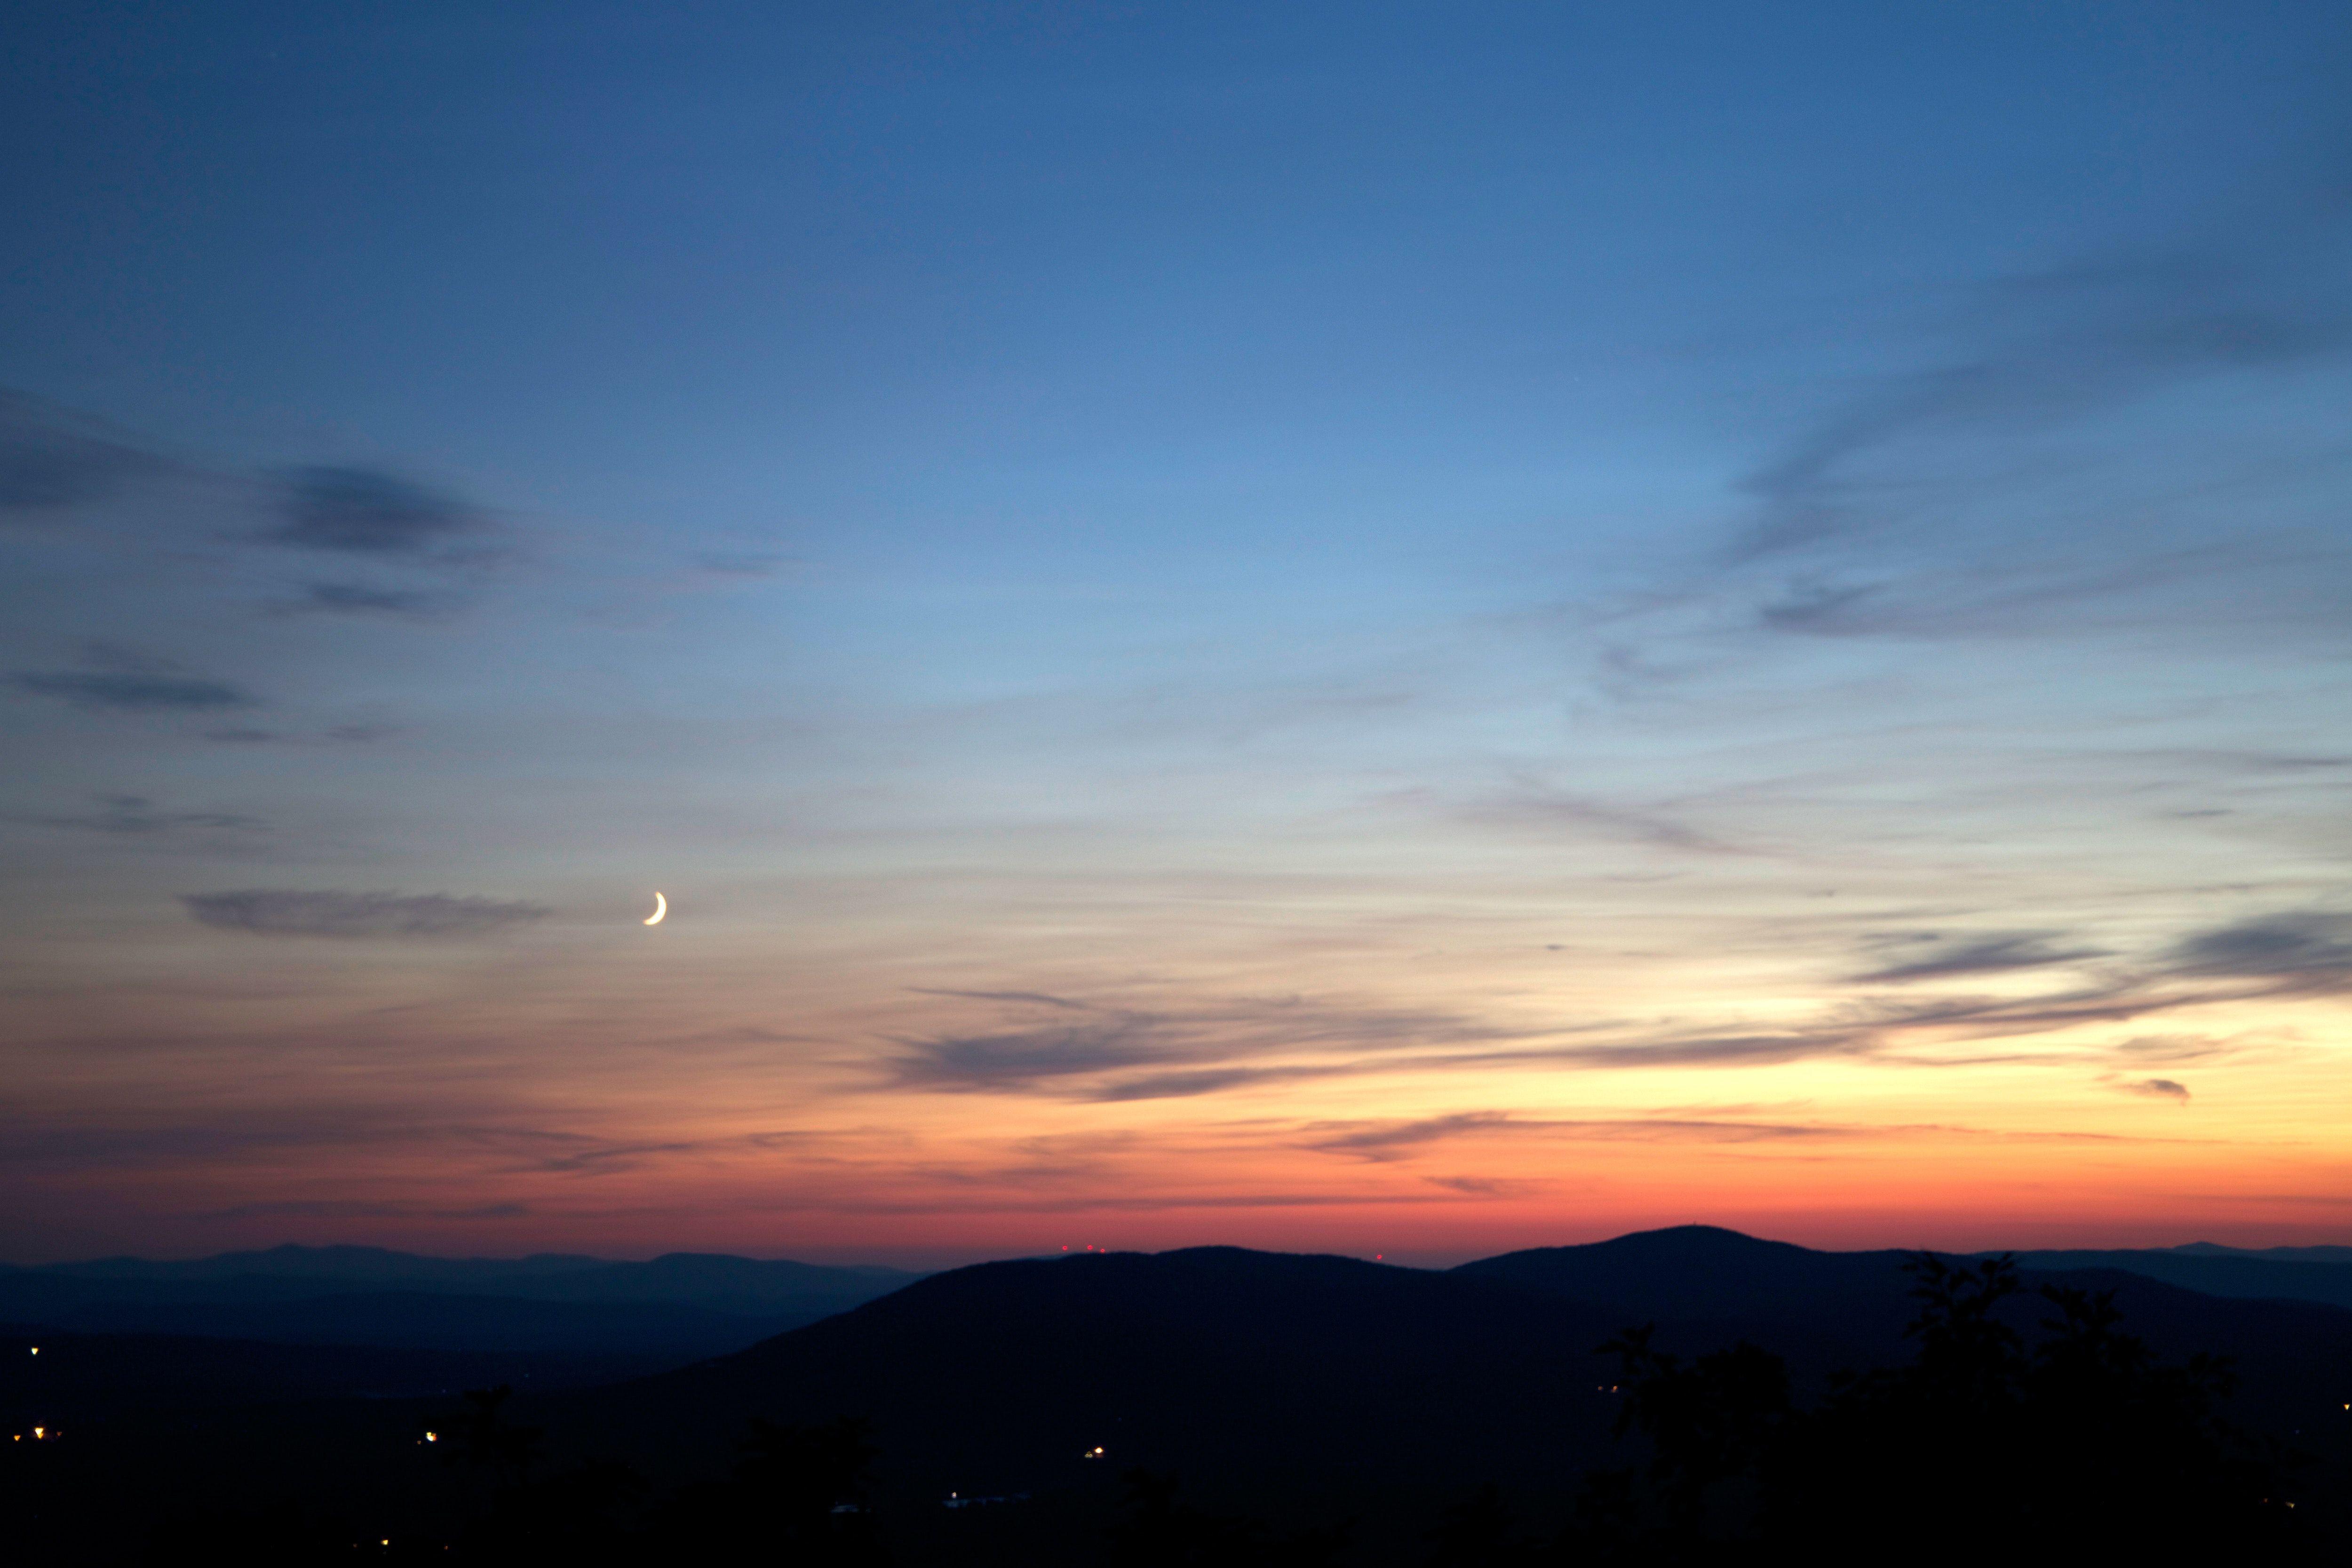 Pin On A New Lens Hd wallpaper sky clouds sunset dusk